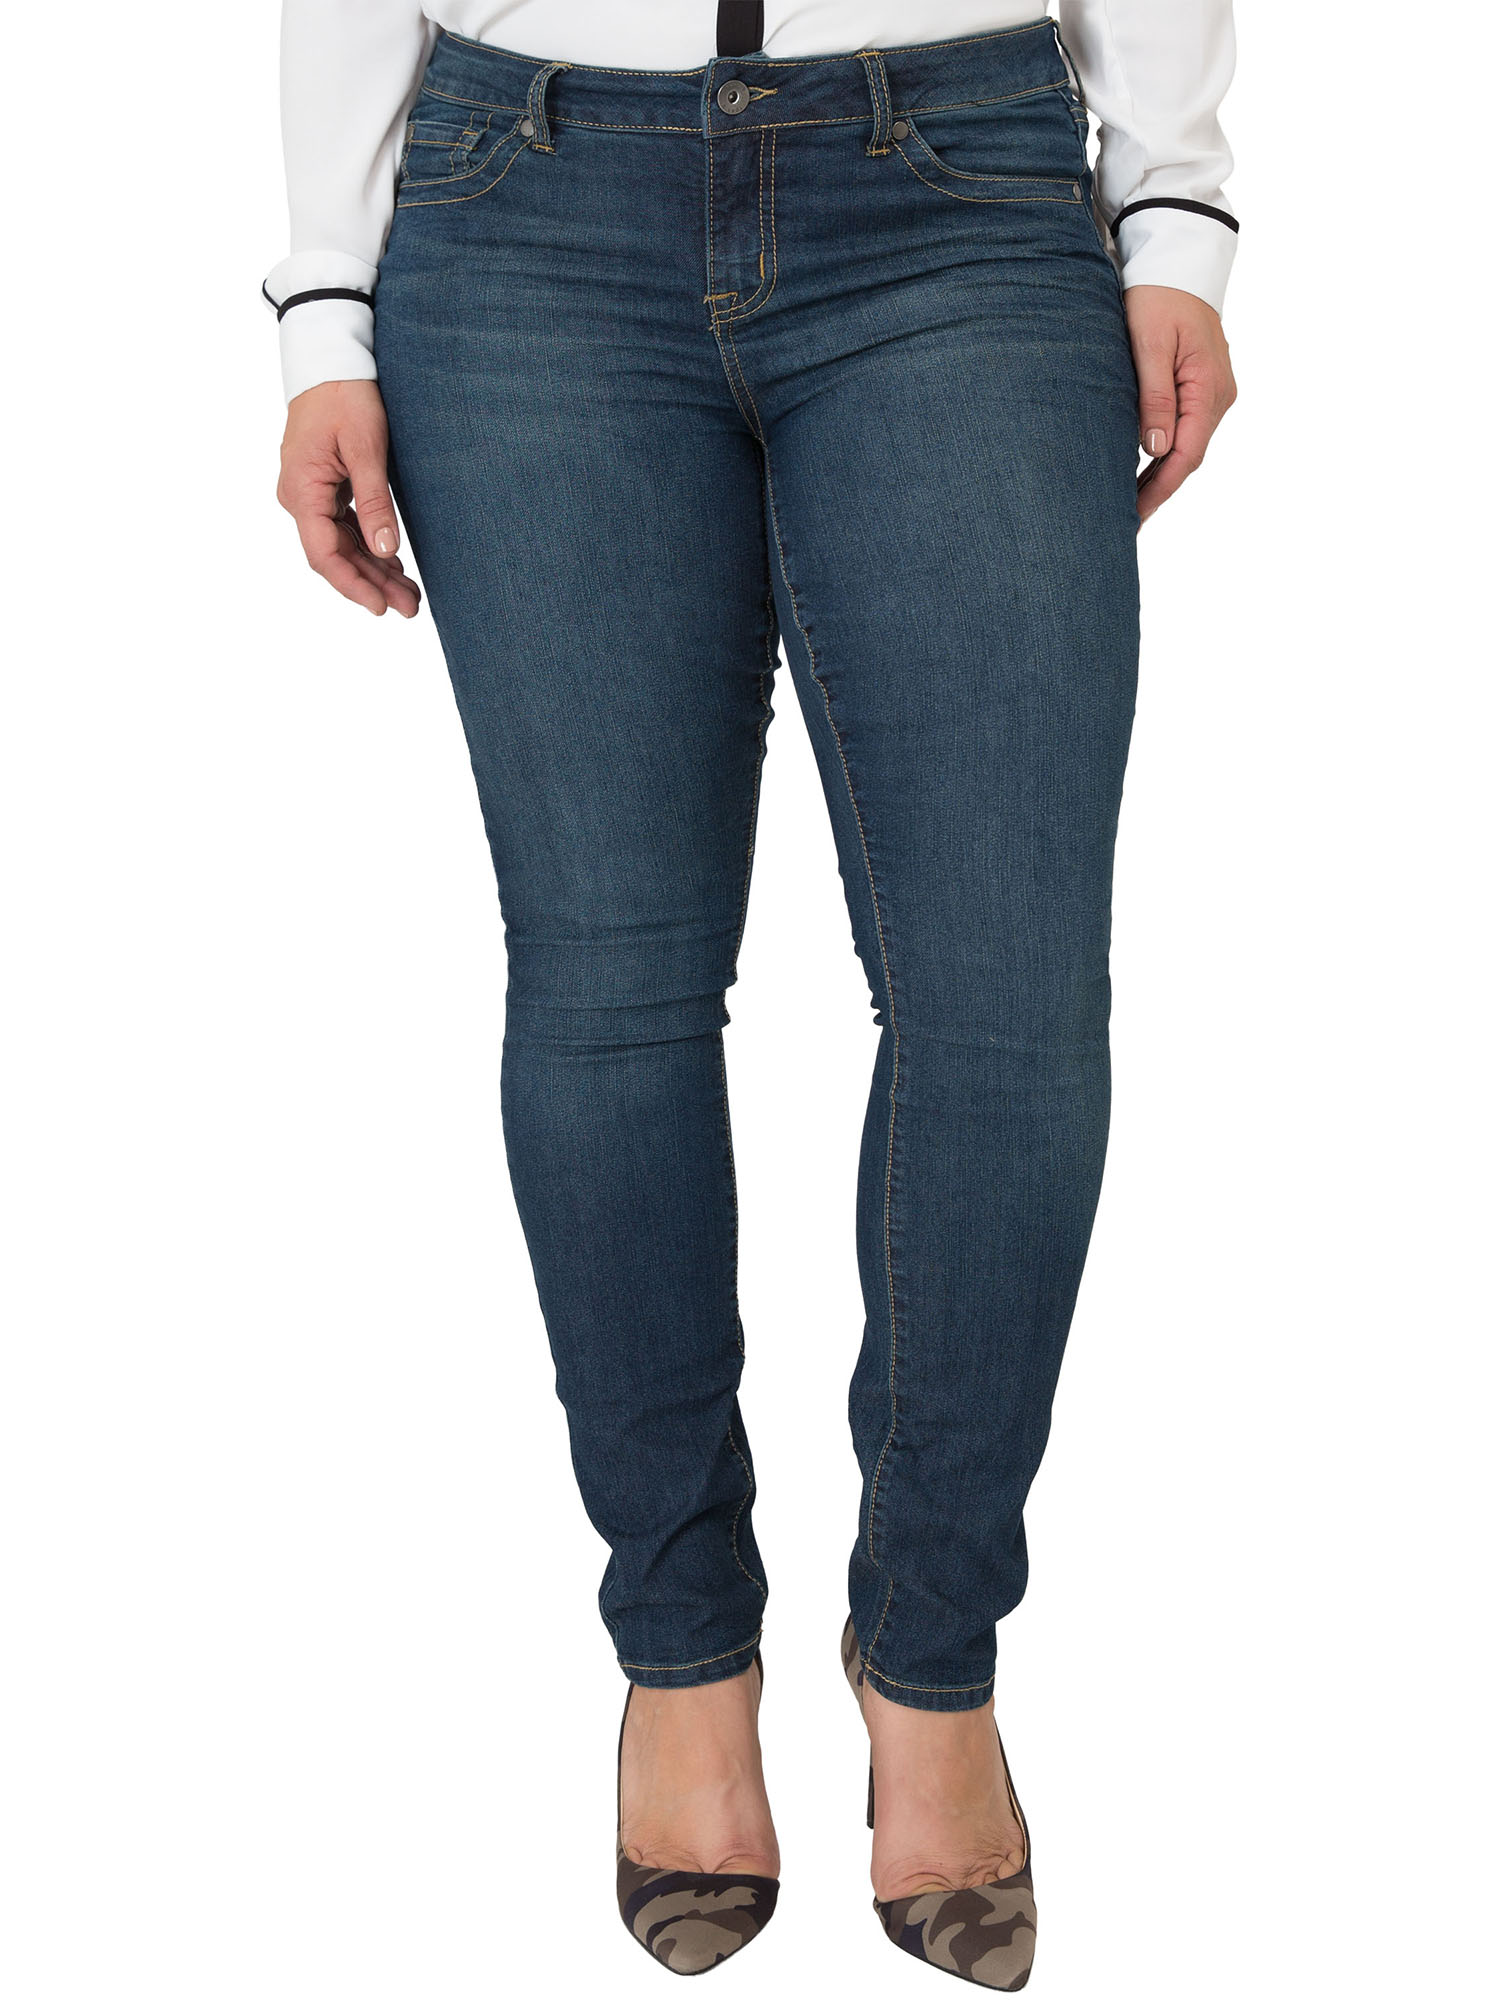 Miss Halladay Plus Size Women's Midrise Dark Wash Skinny Jeans Size 10 To 30